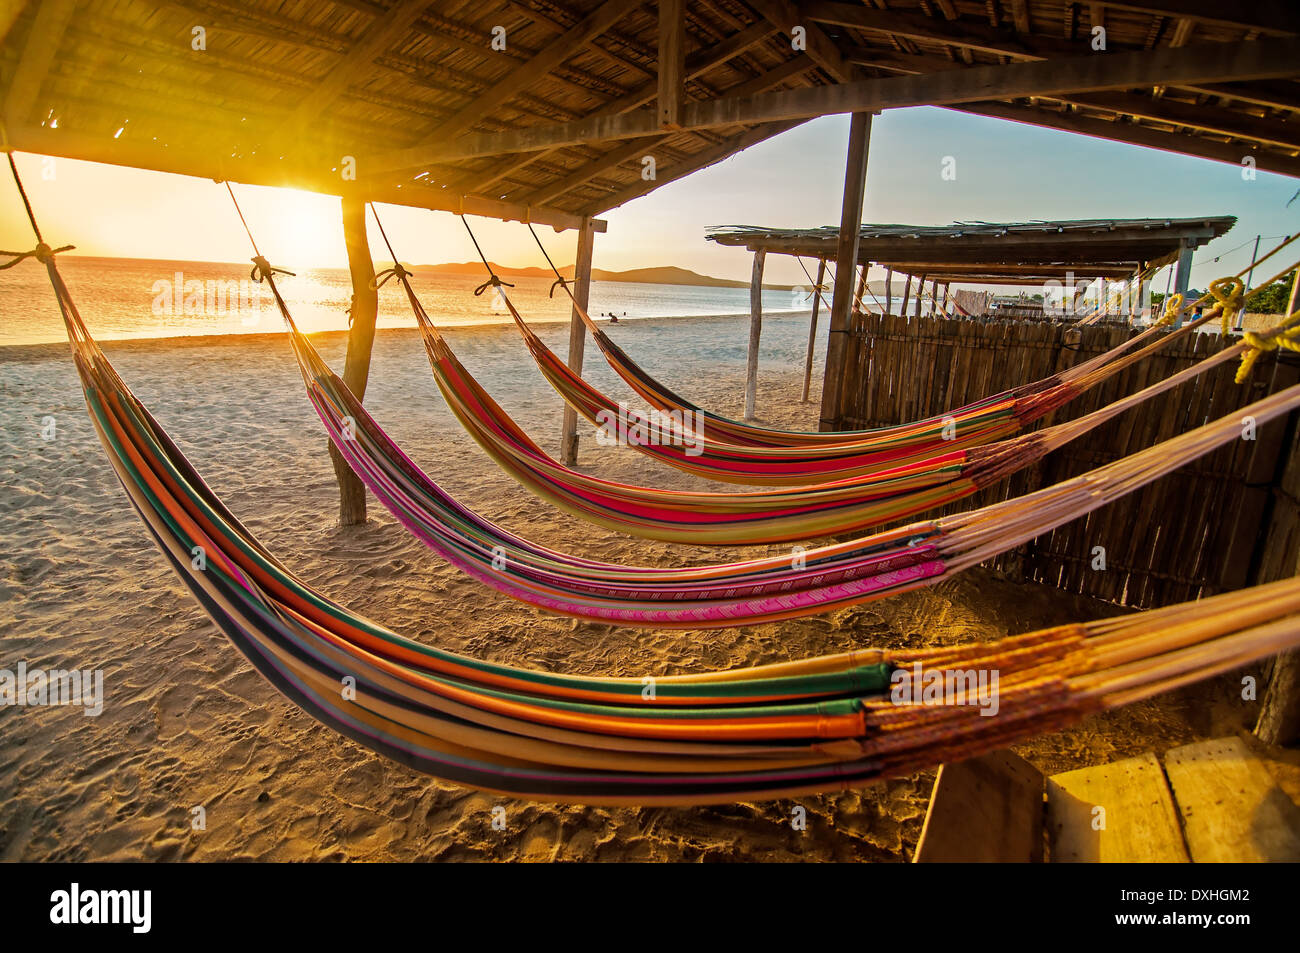 Hammocks on a beach at sunset. - Stock Image